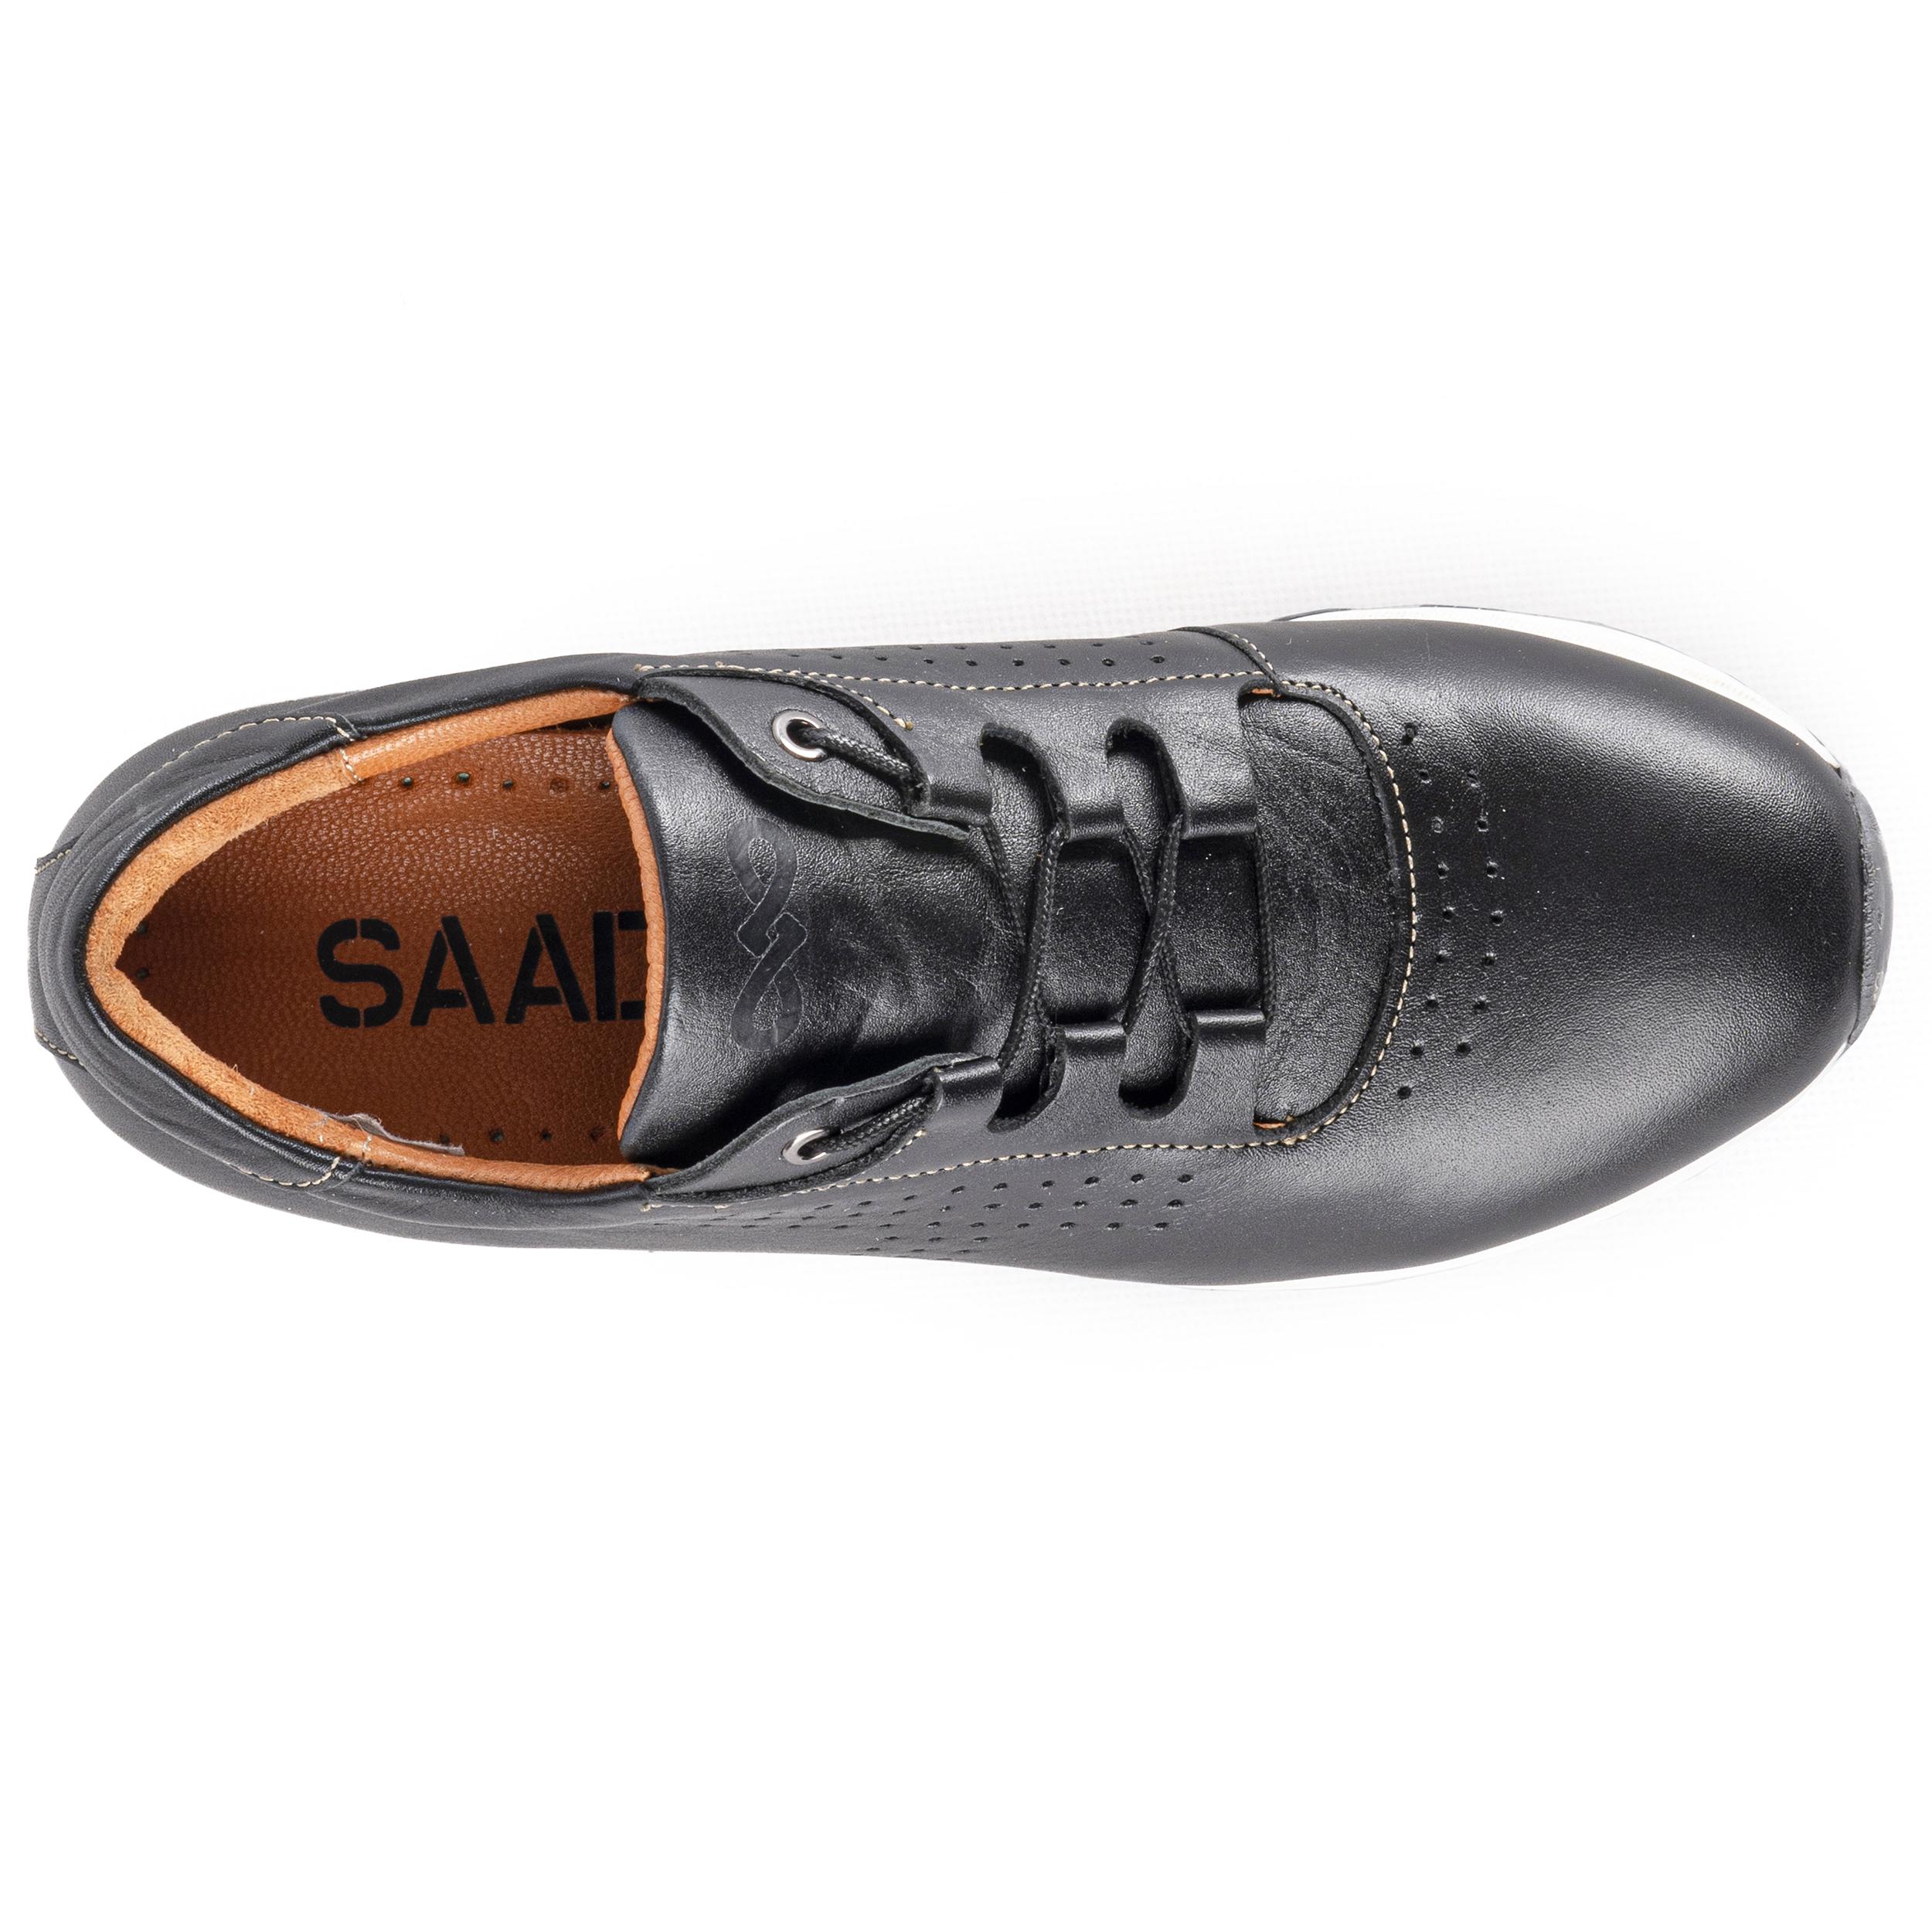 کفش روزمره زنانه صاد کد PP1207